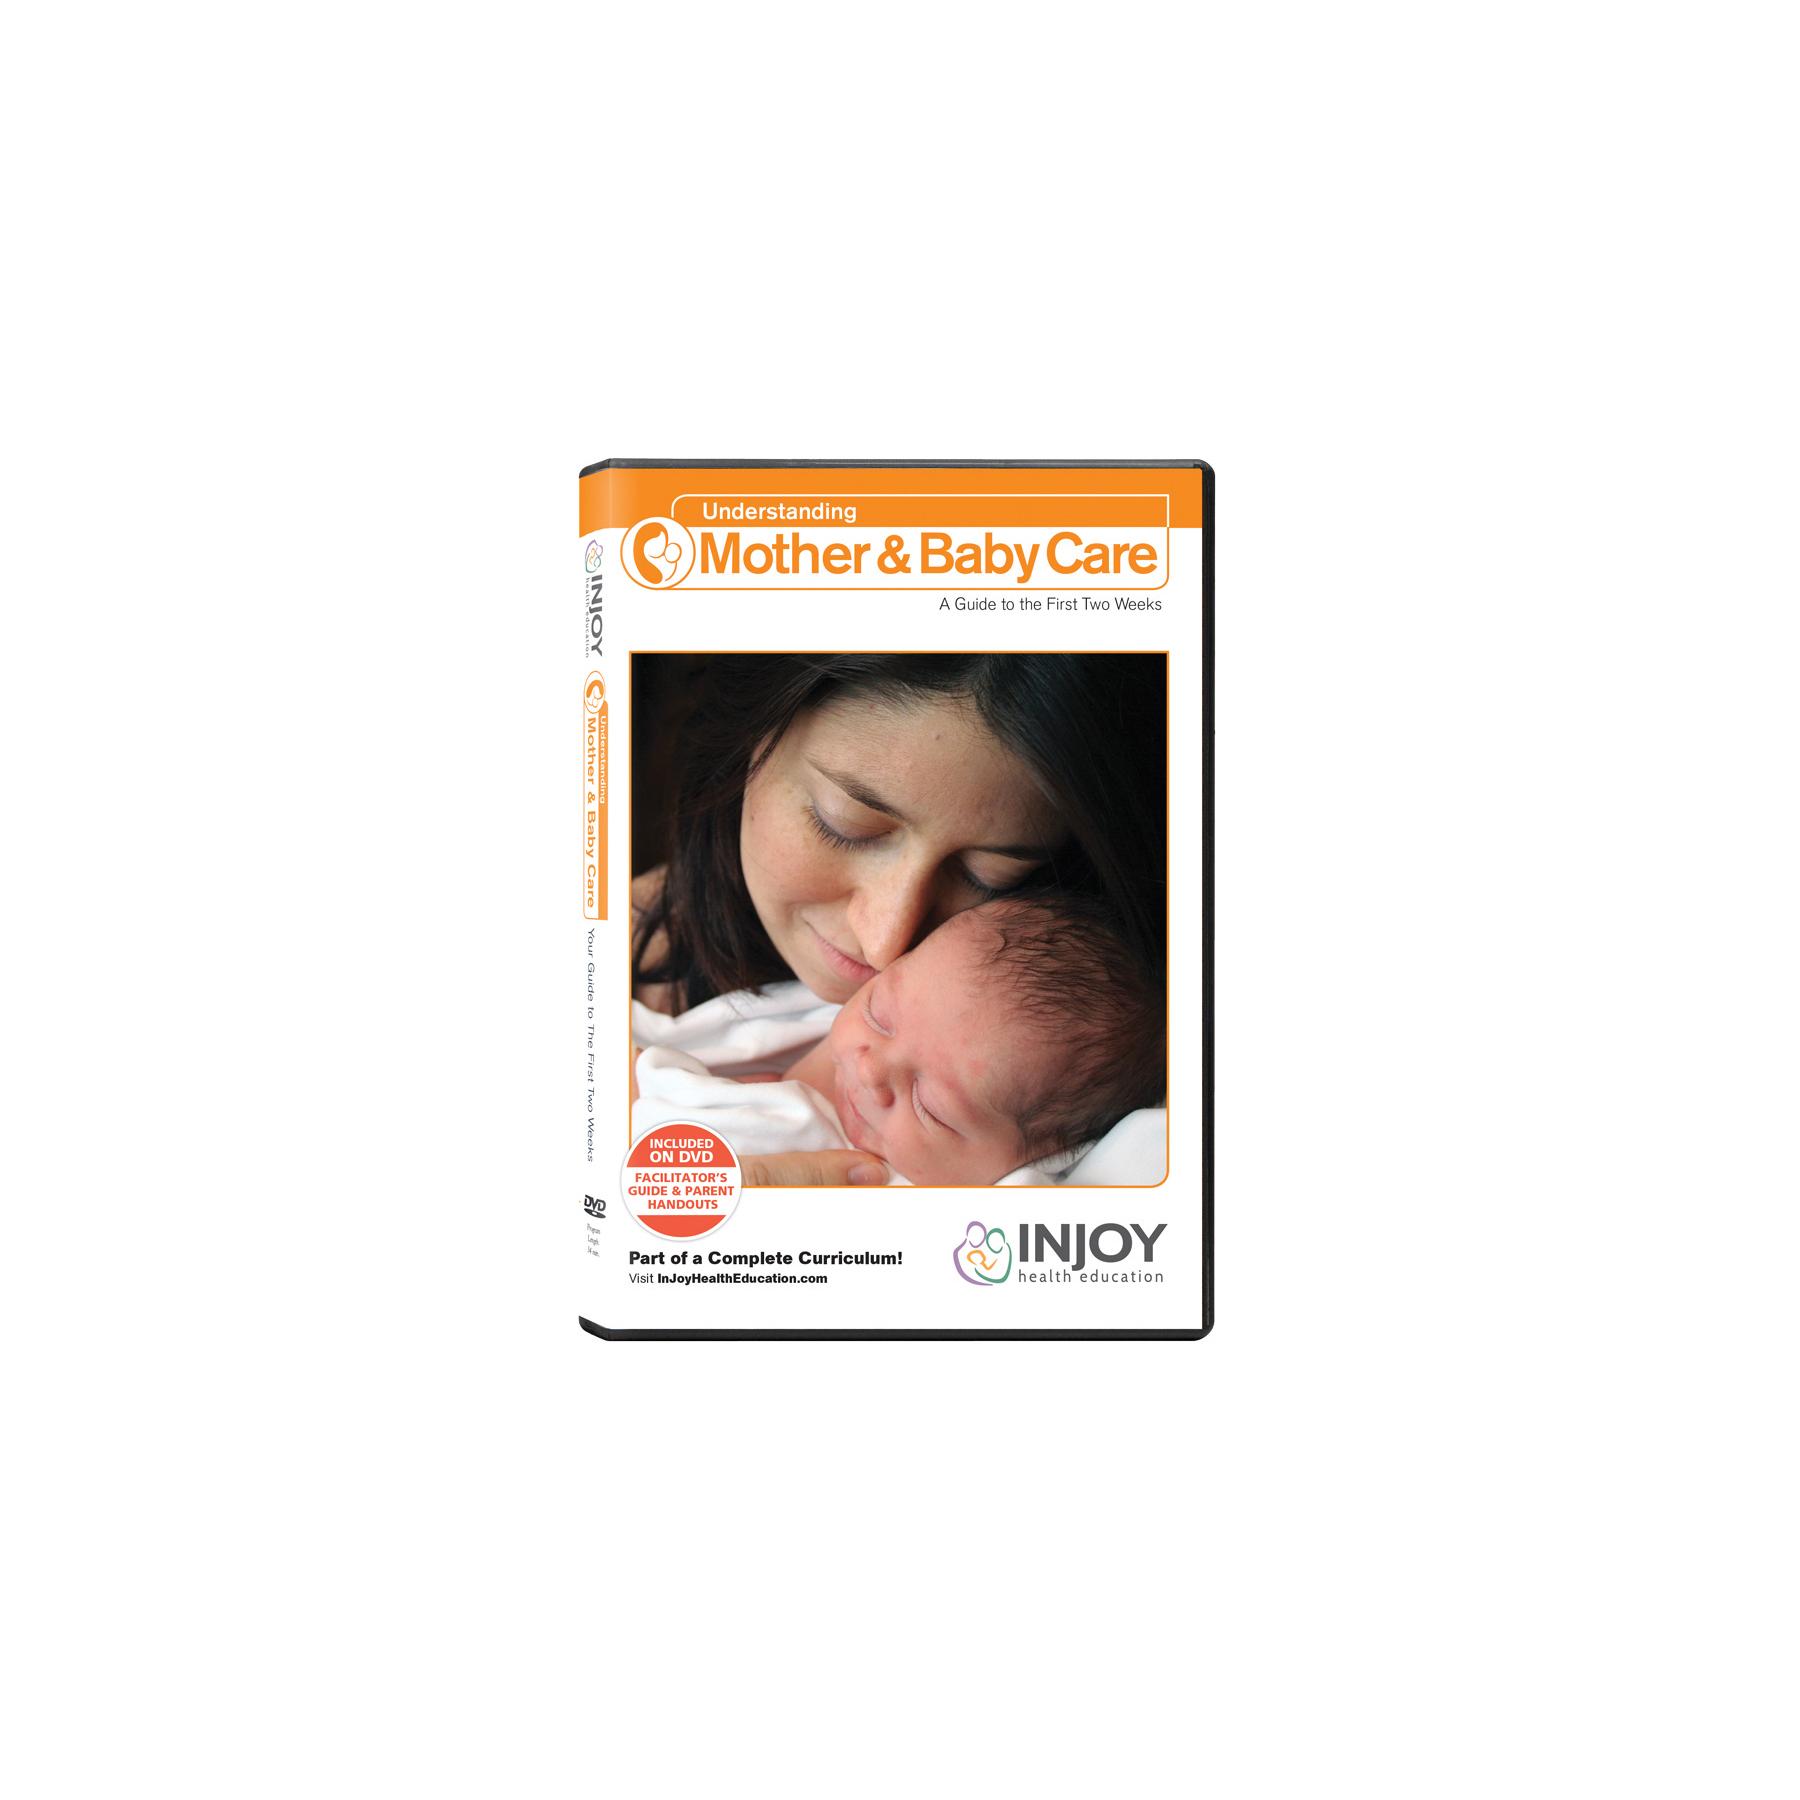 Childbirth Graphics; Health Edco; baby friendly; postpartum care; baby blues; mood disorders; breastfeeding; newborn care; 48954